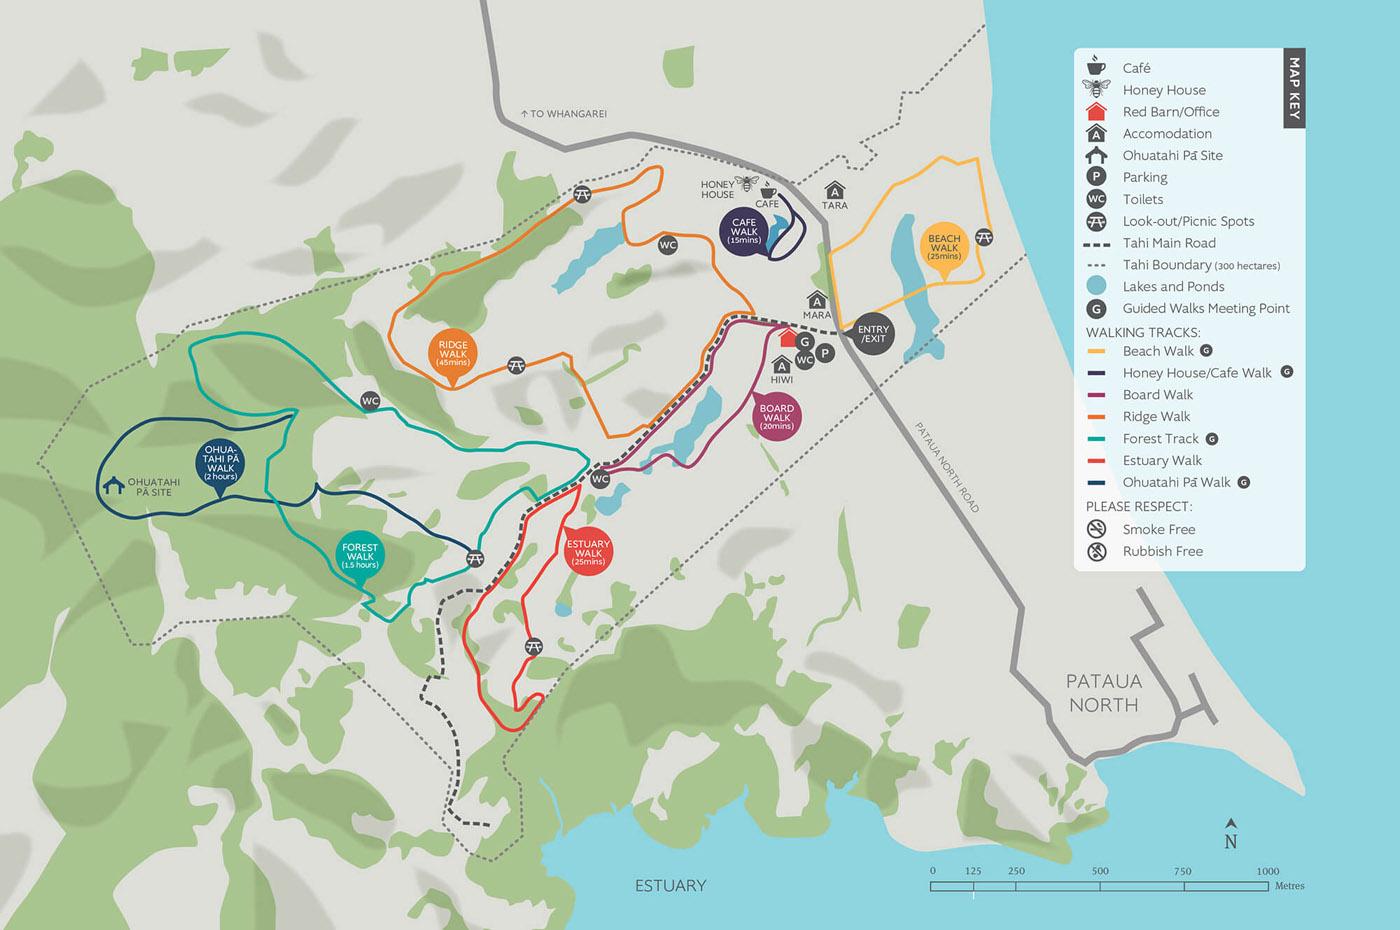 5-Tahi-Nature-Reserve-Estate-Walks-Map-Activities-and-Surroundings-Pataua-North-New-Zealand-Additional-member-property-Solstice-Club.jpg